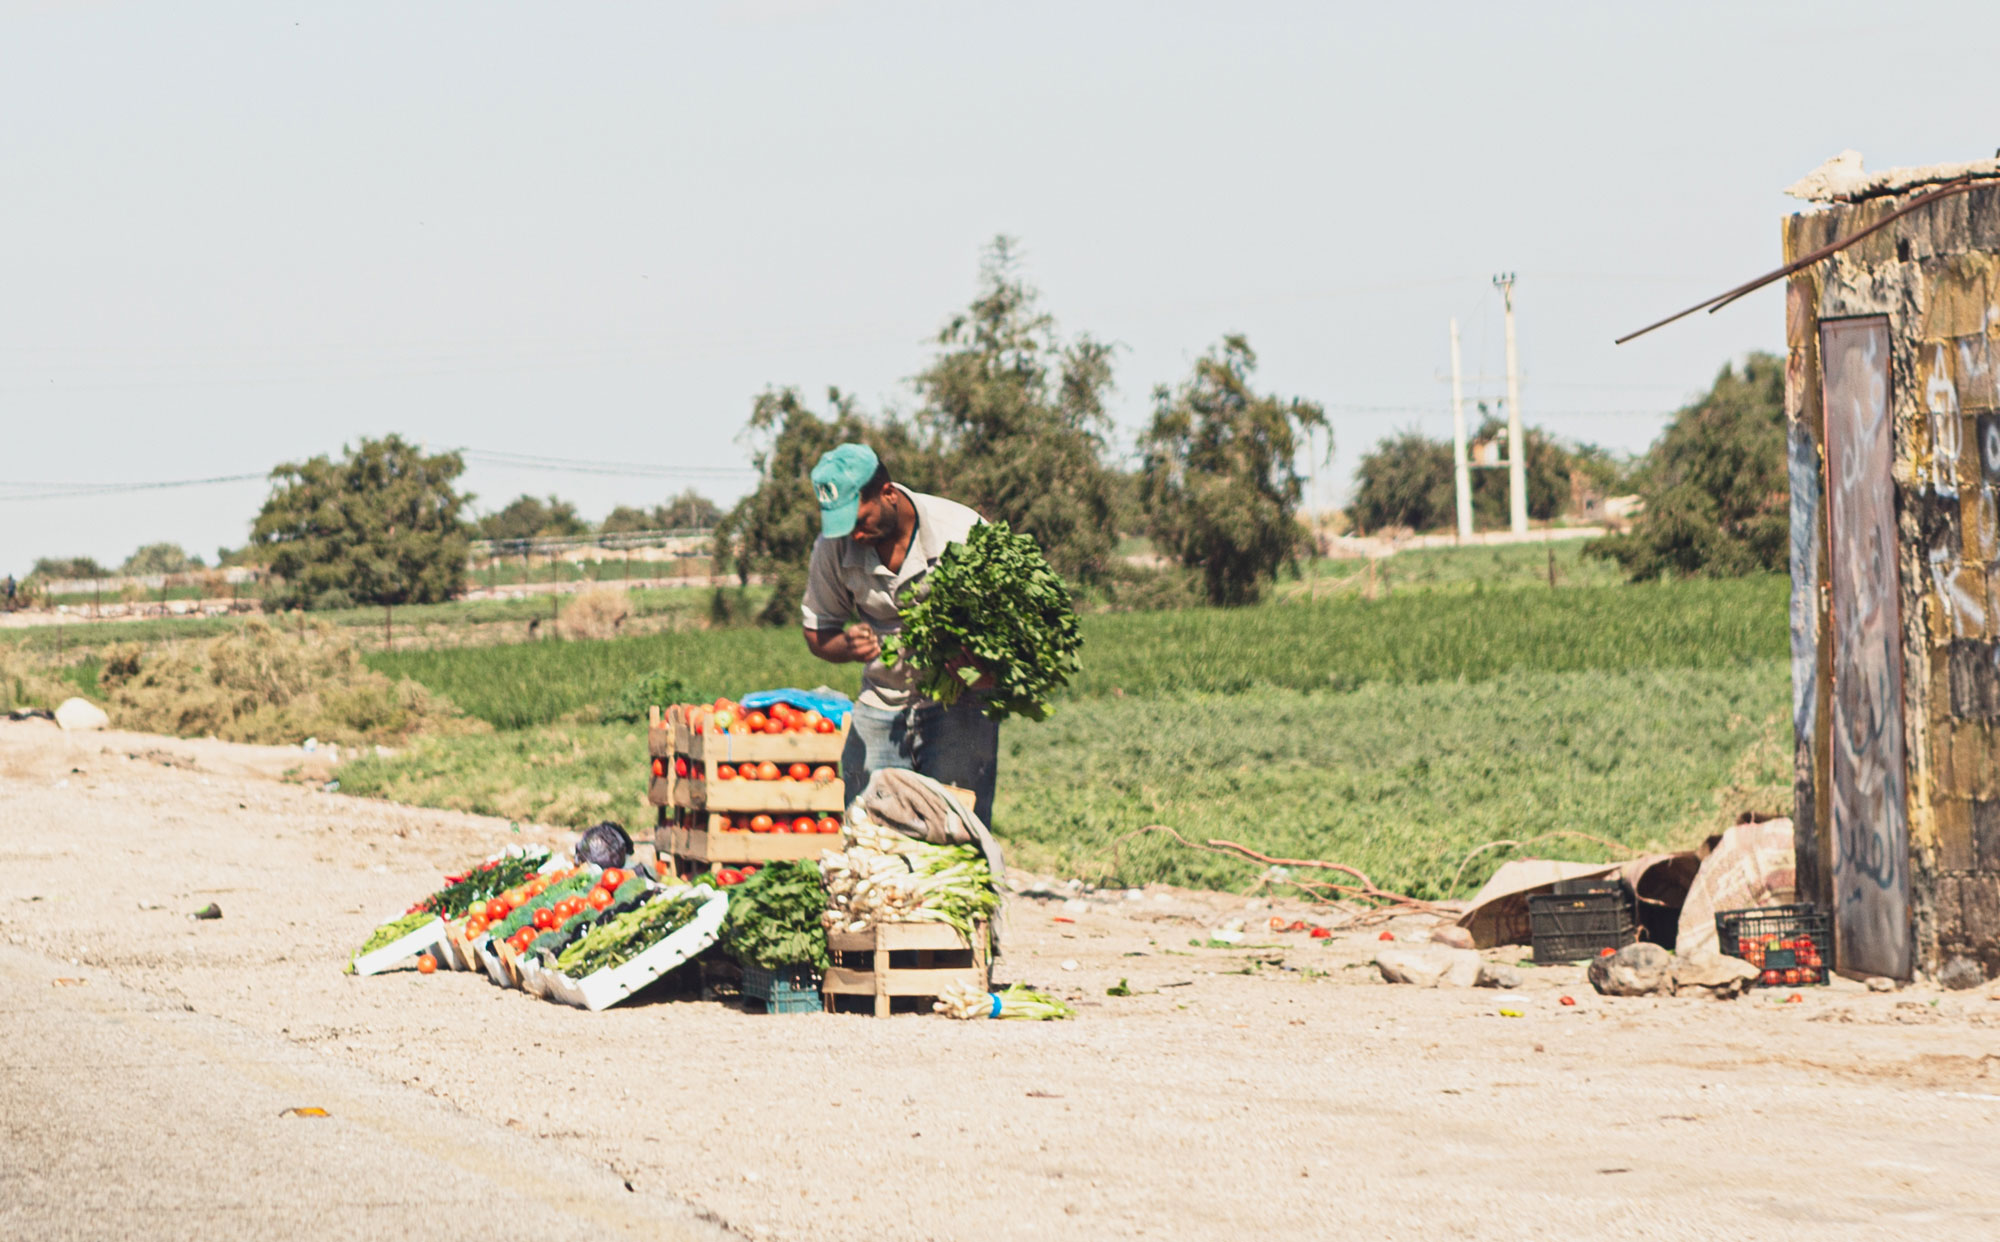 voyage en Jordanie marché